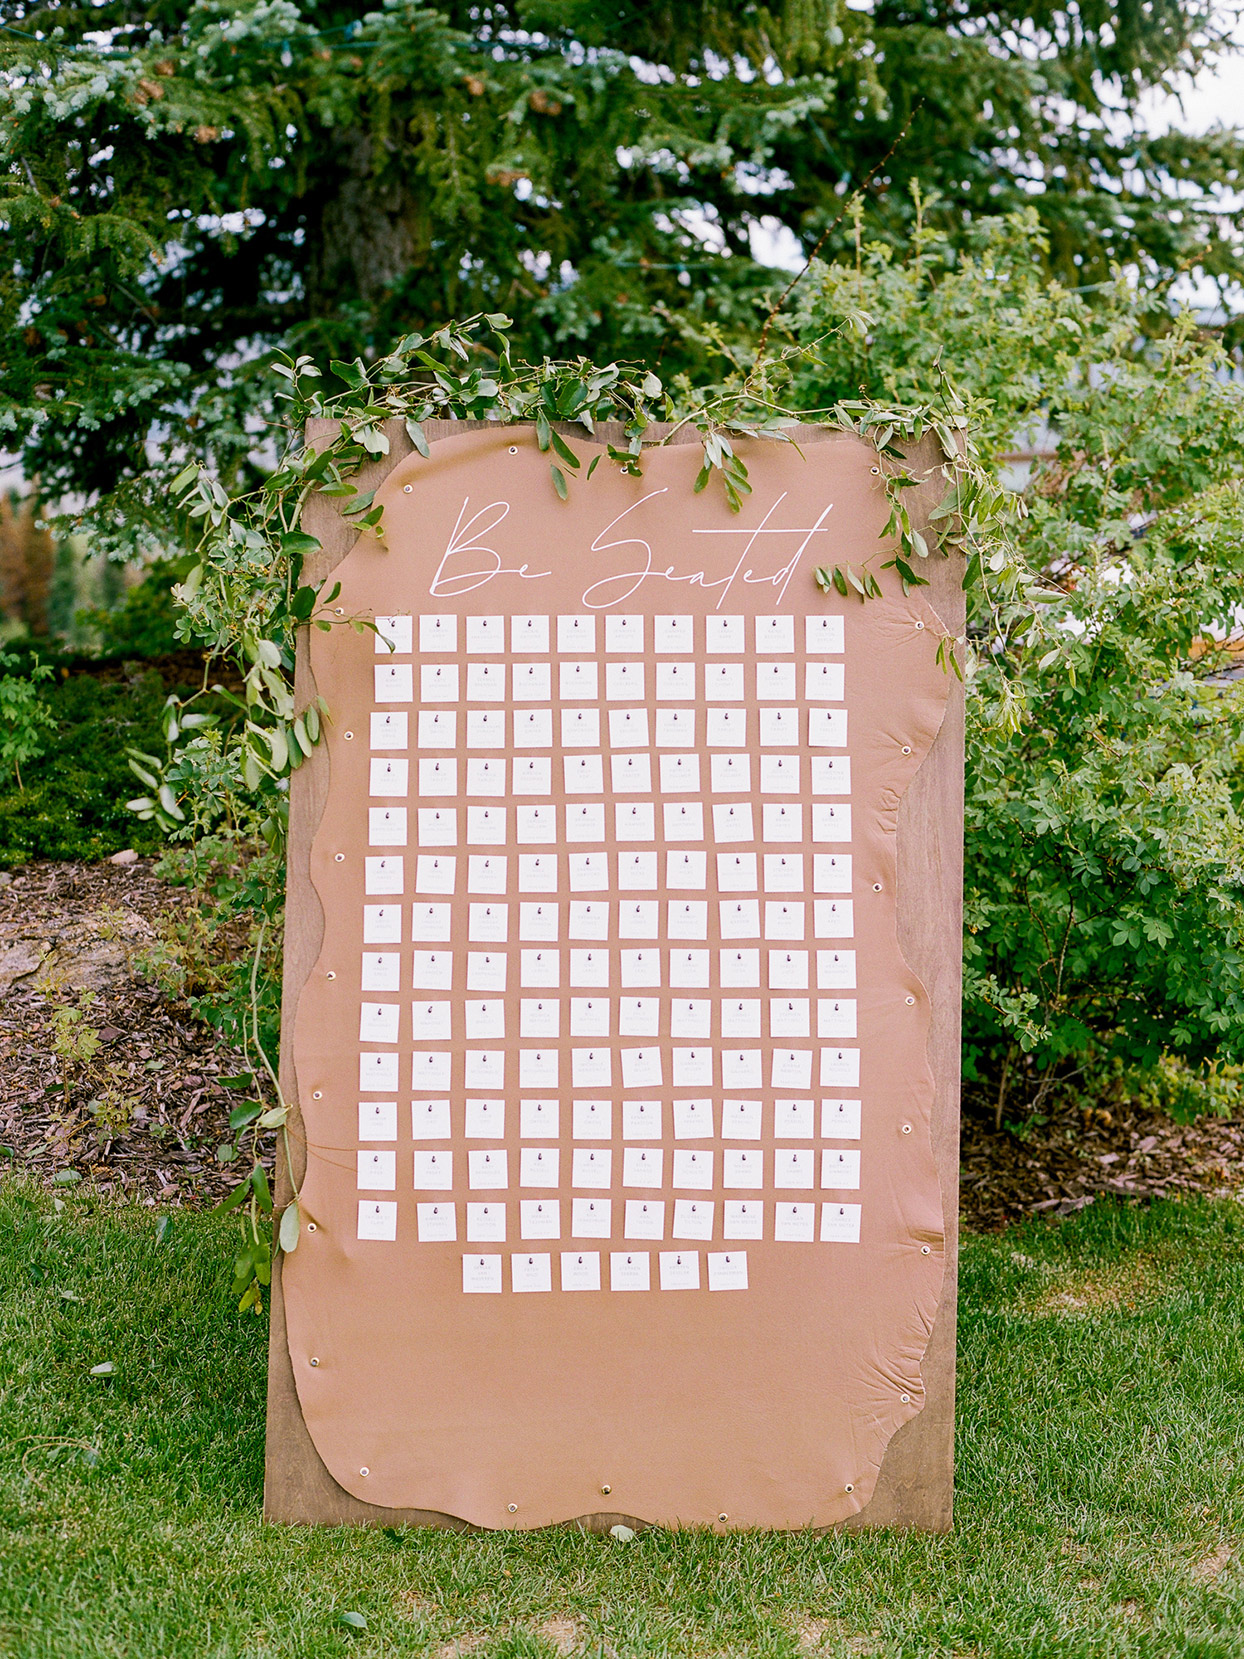 logan conor wedding reception seating chart